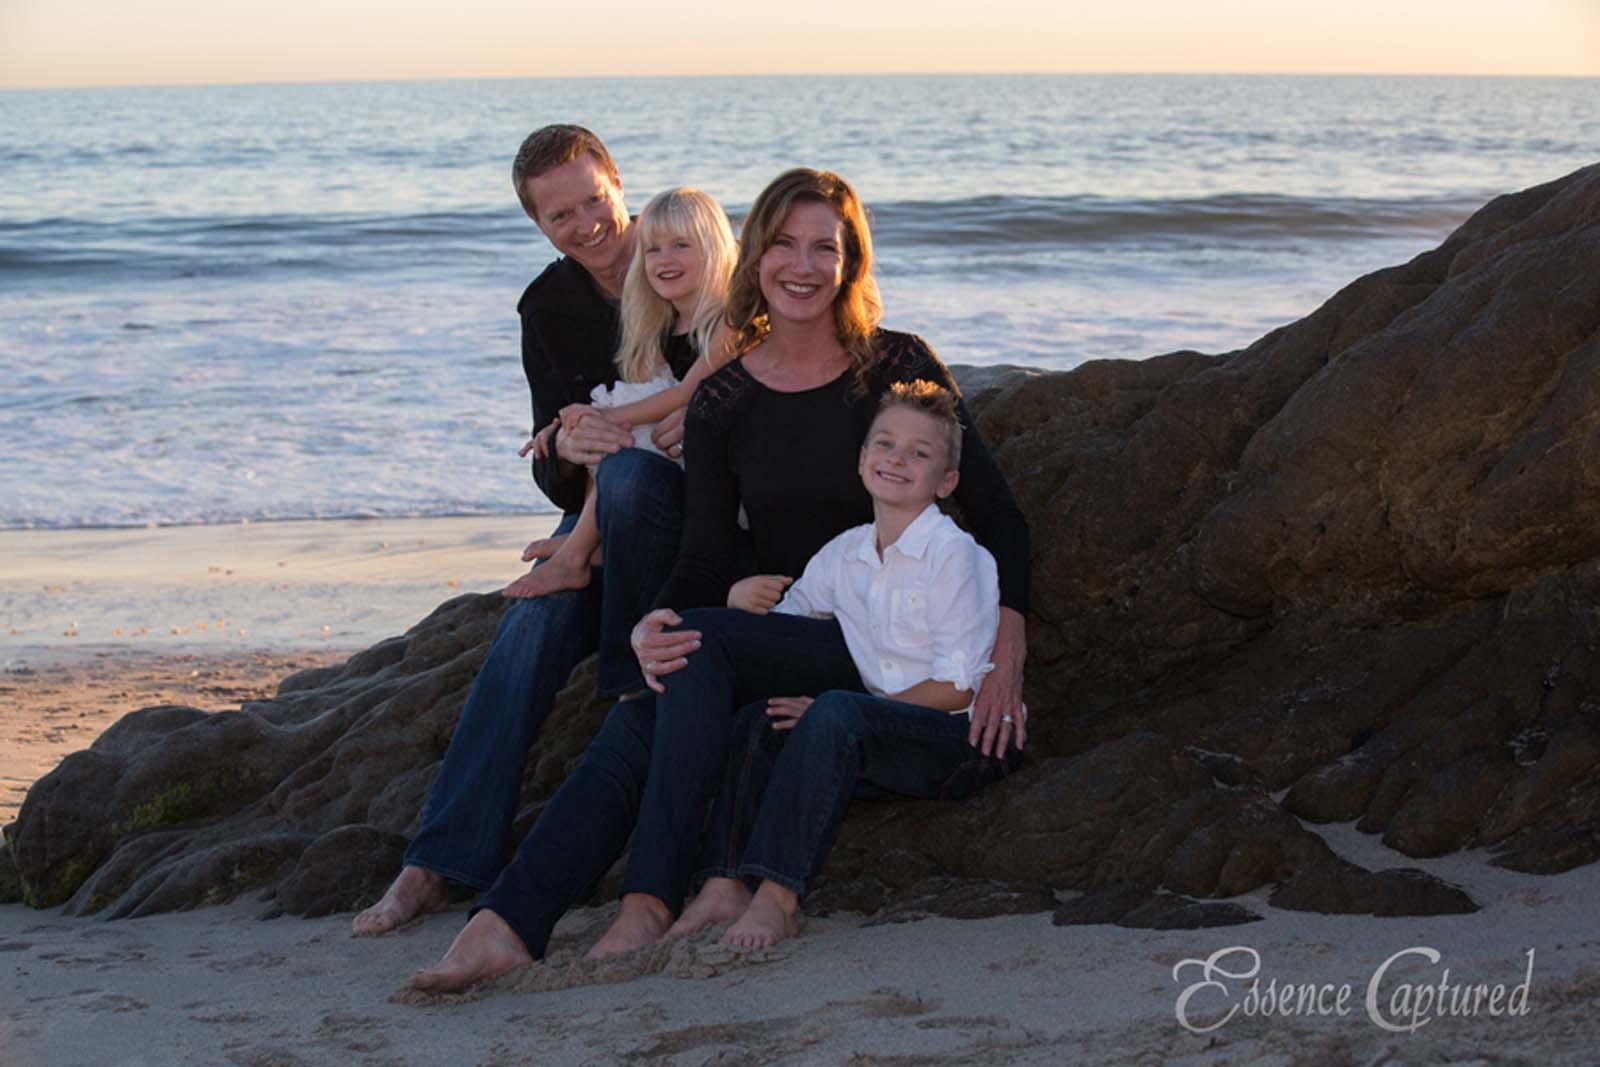 beach family portrait sunset sitting on rock ocean backdrop